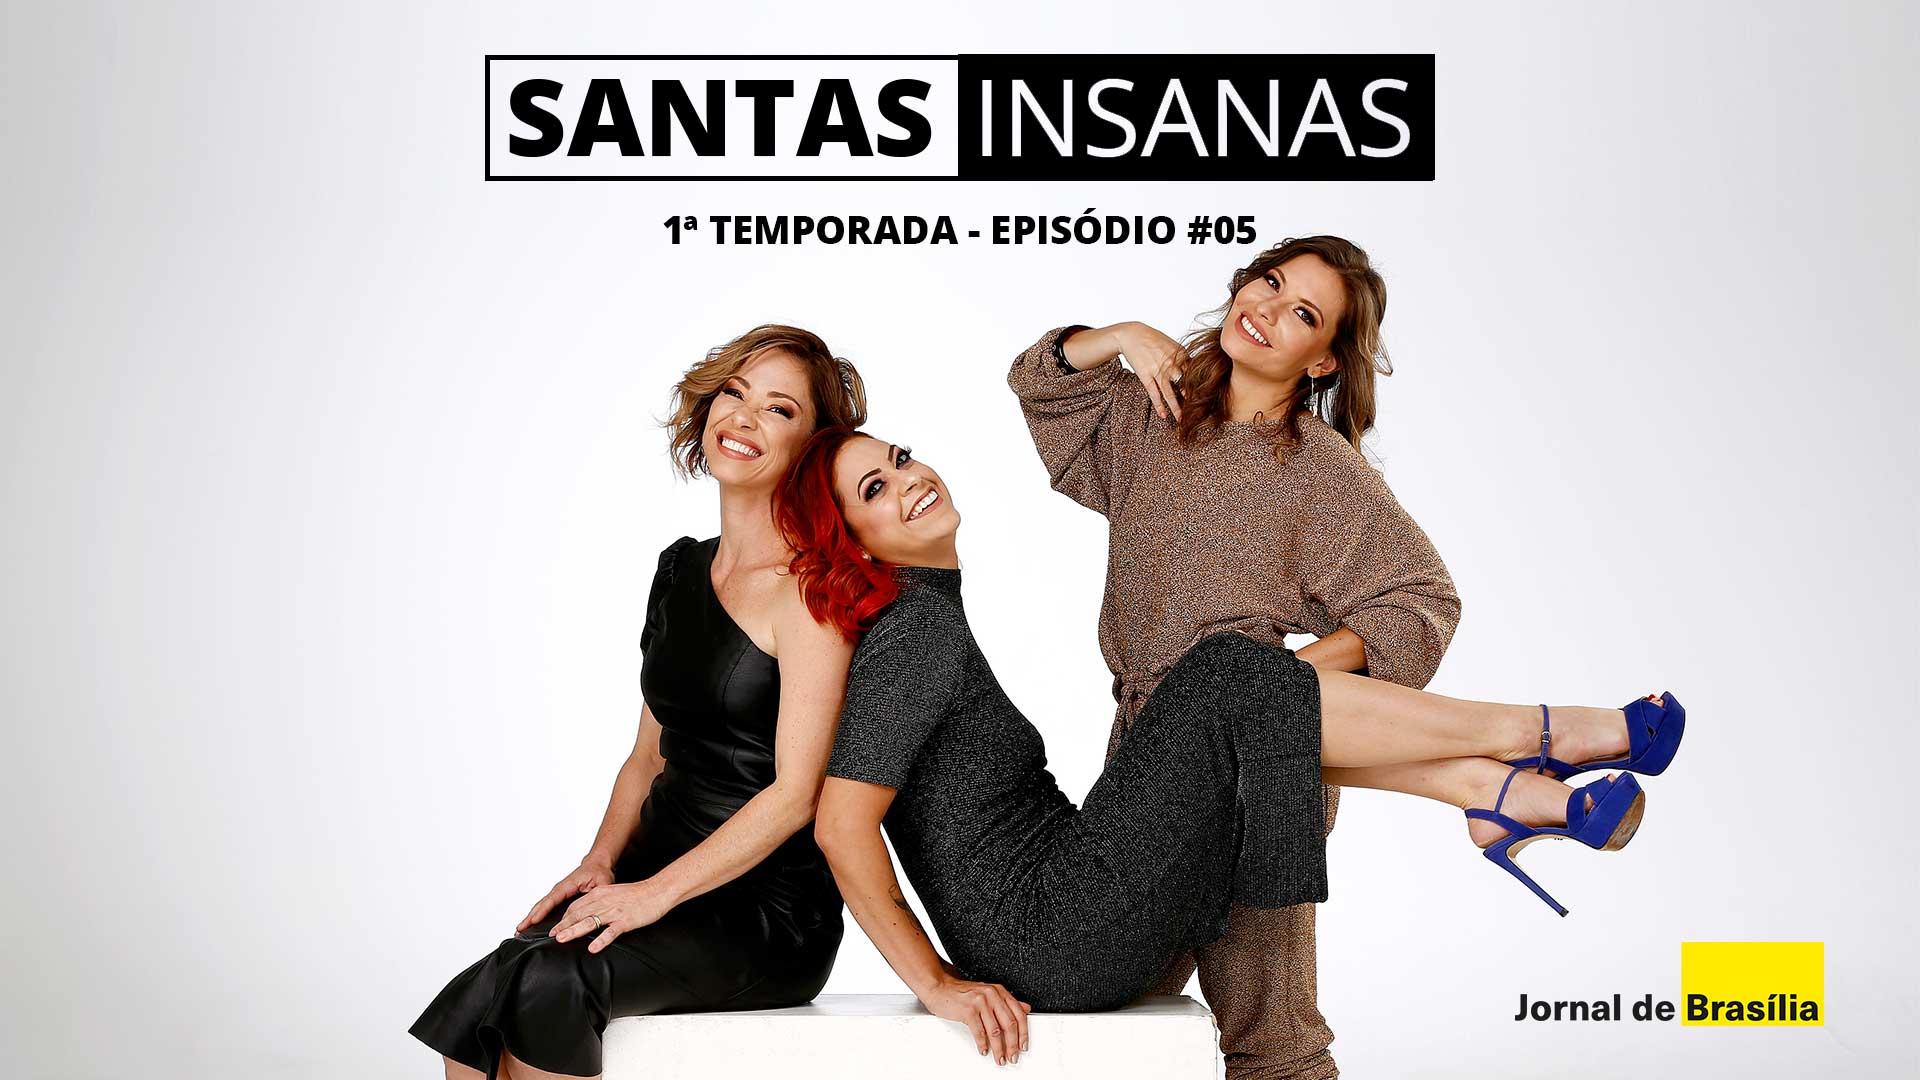 Santas Insanas - 1ª Temporada - Episódio #05